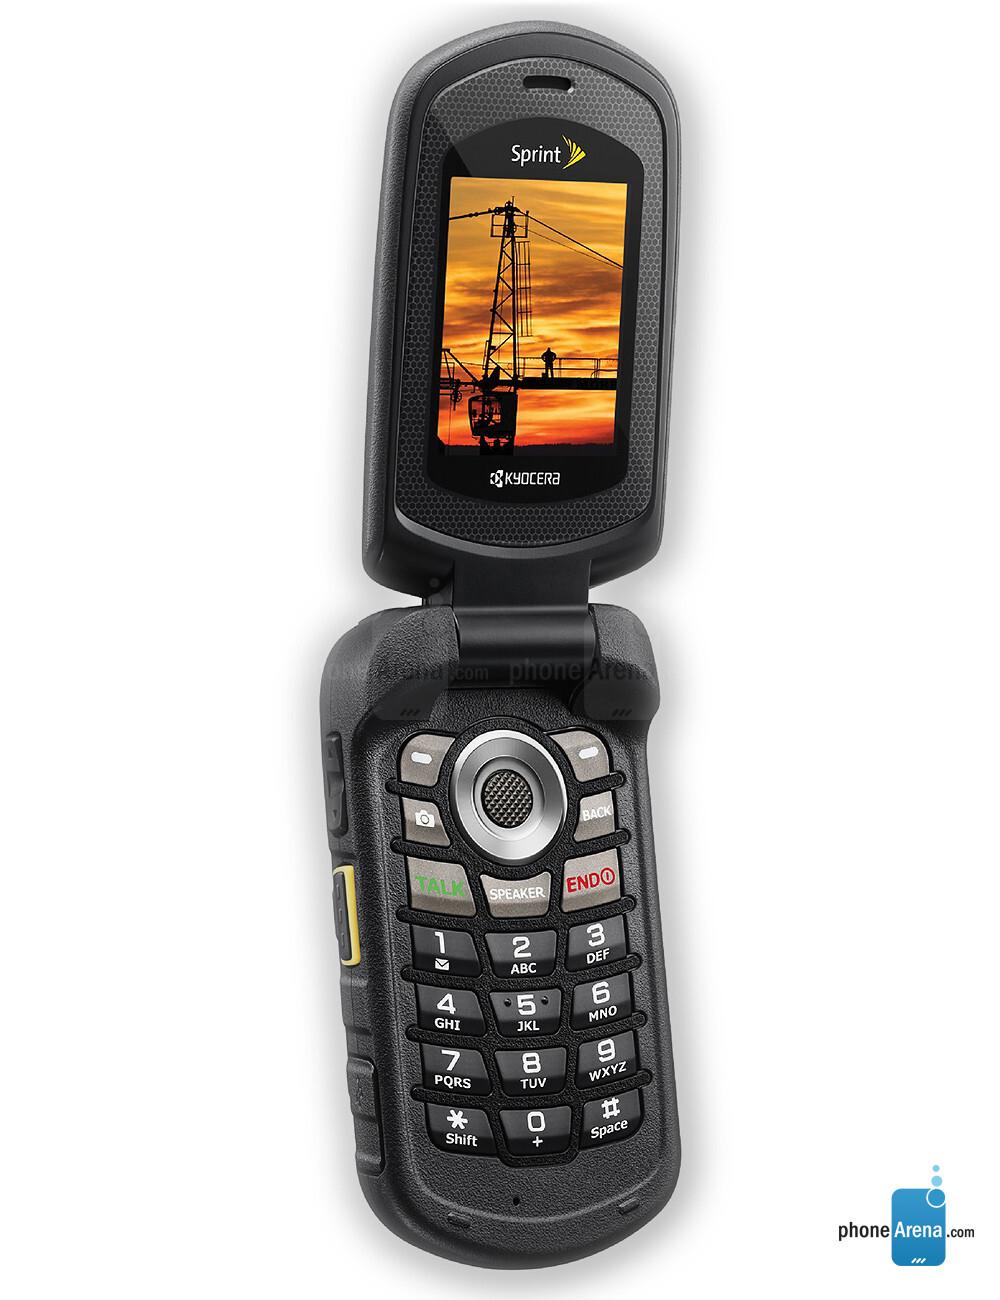 kyocera duraxt rh wisetrail com Sprint Kyocera Flip Phone Sprint Kyocera Transfer Cable